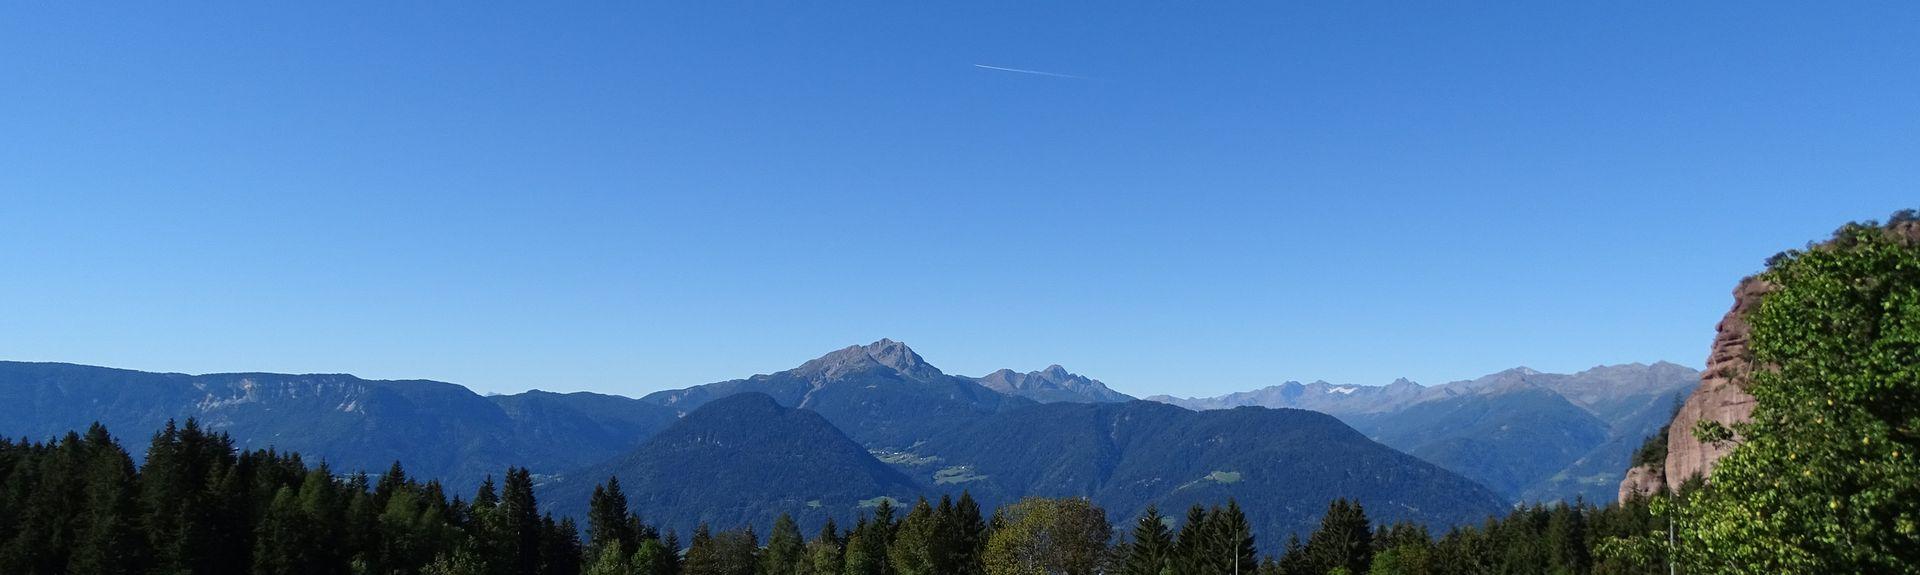 Postal, Trentino-Alto Adige, Itália